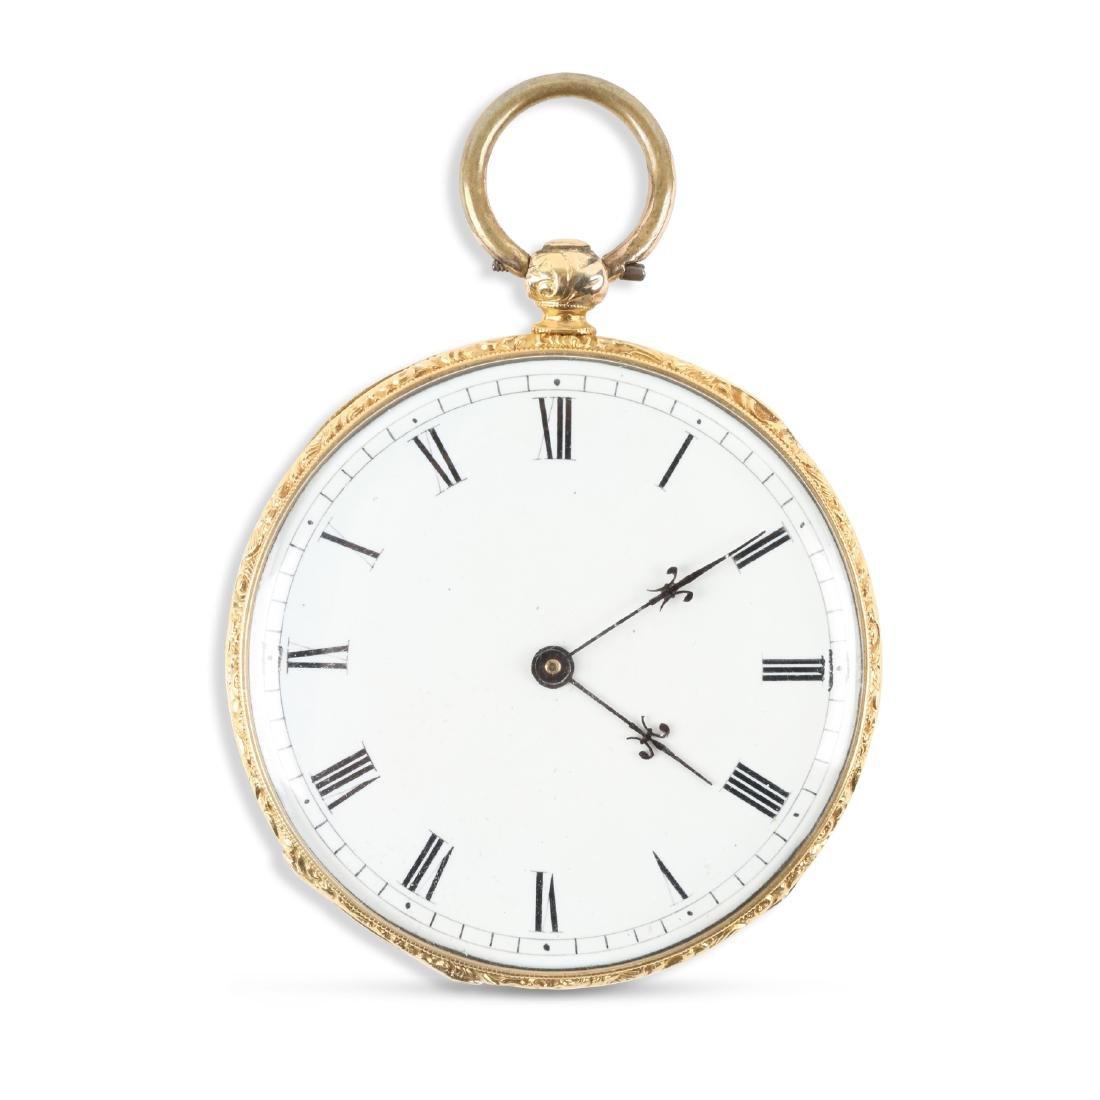 Aiguilles Courvoisier & Fils, 18K Pocket Watch